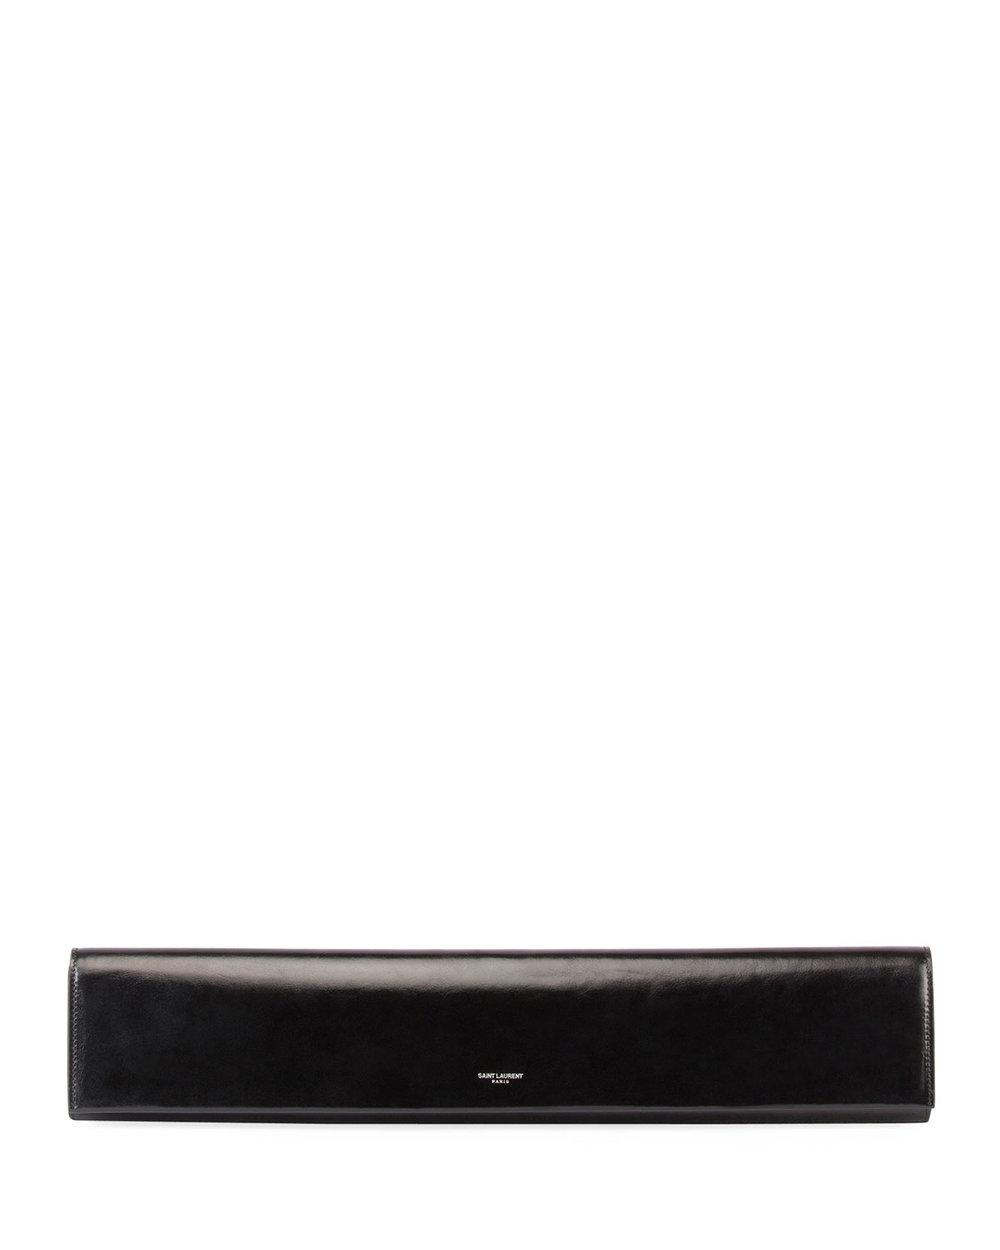 Saint Laurent Fetiche Exaggerated East-West Leather Clutch Bag. Neiman Marcus. $1,550.